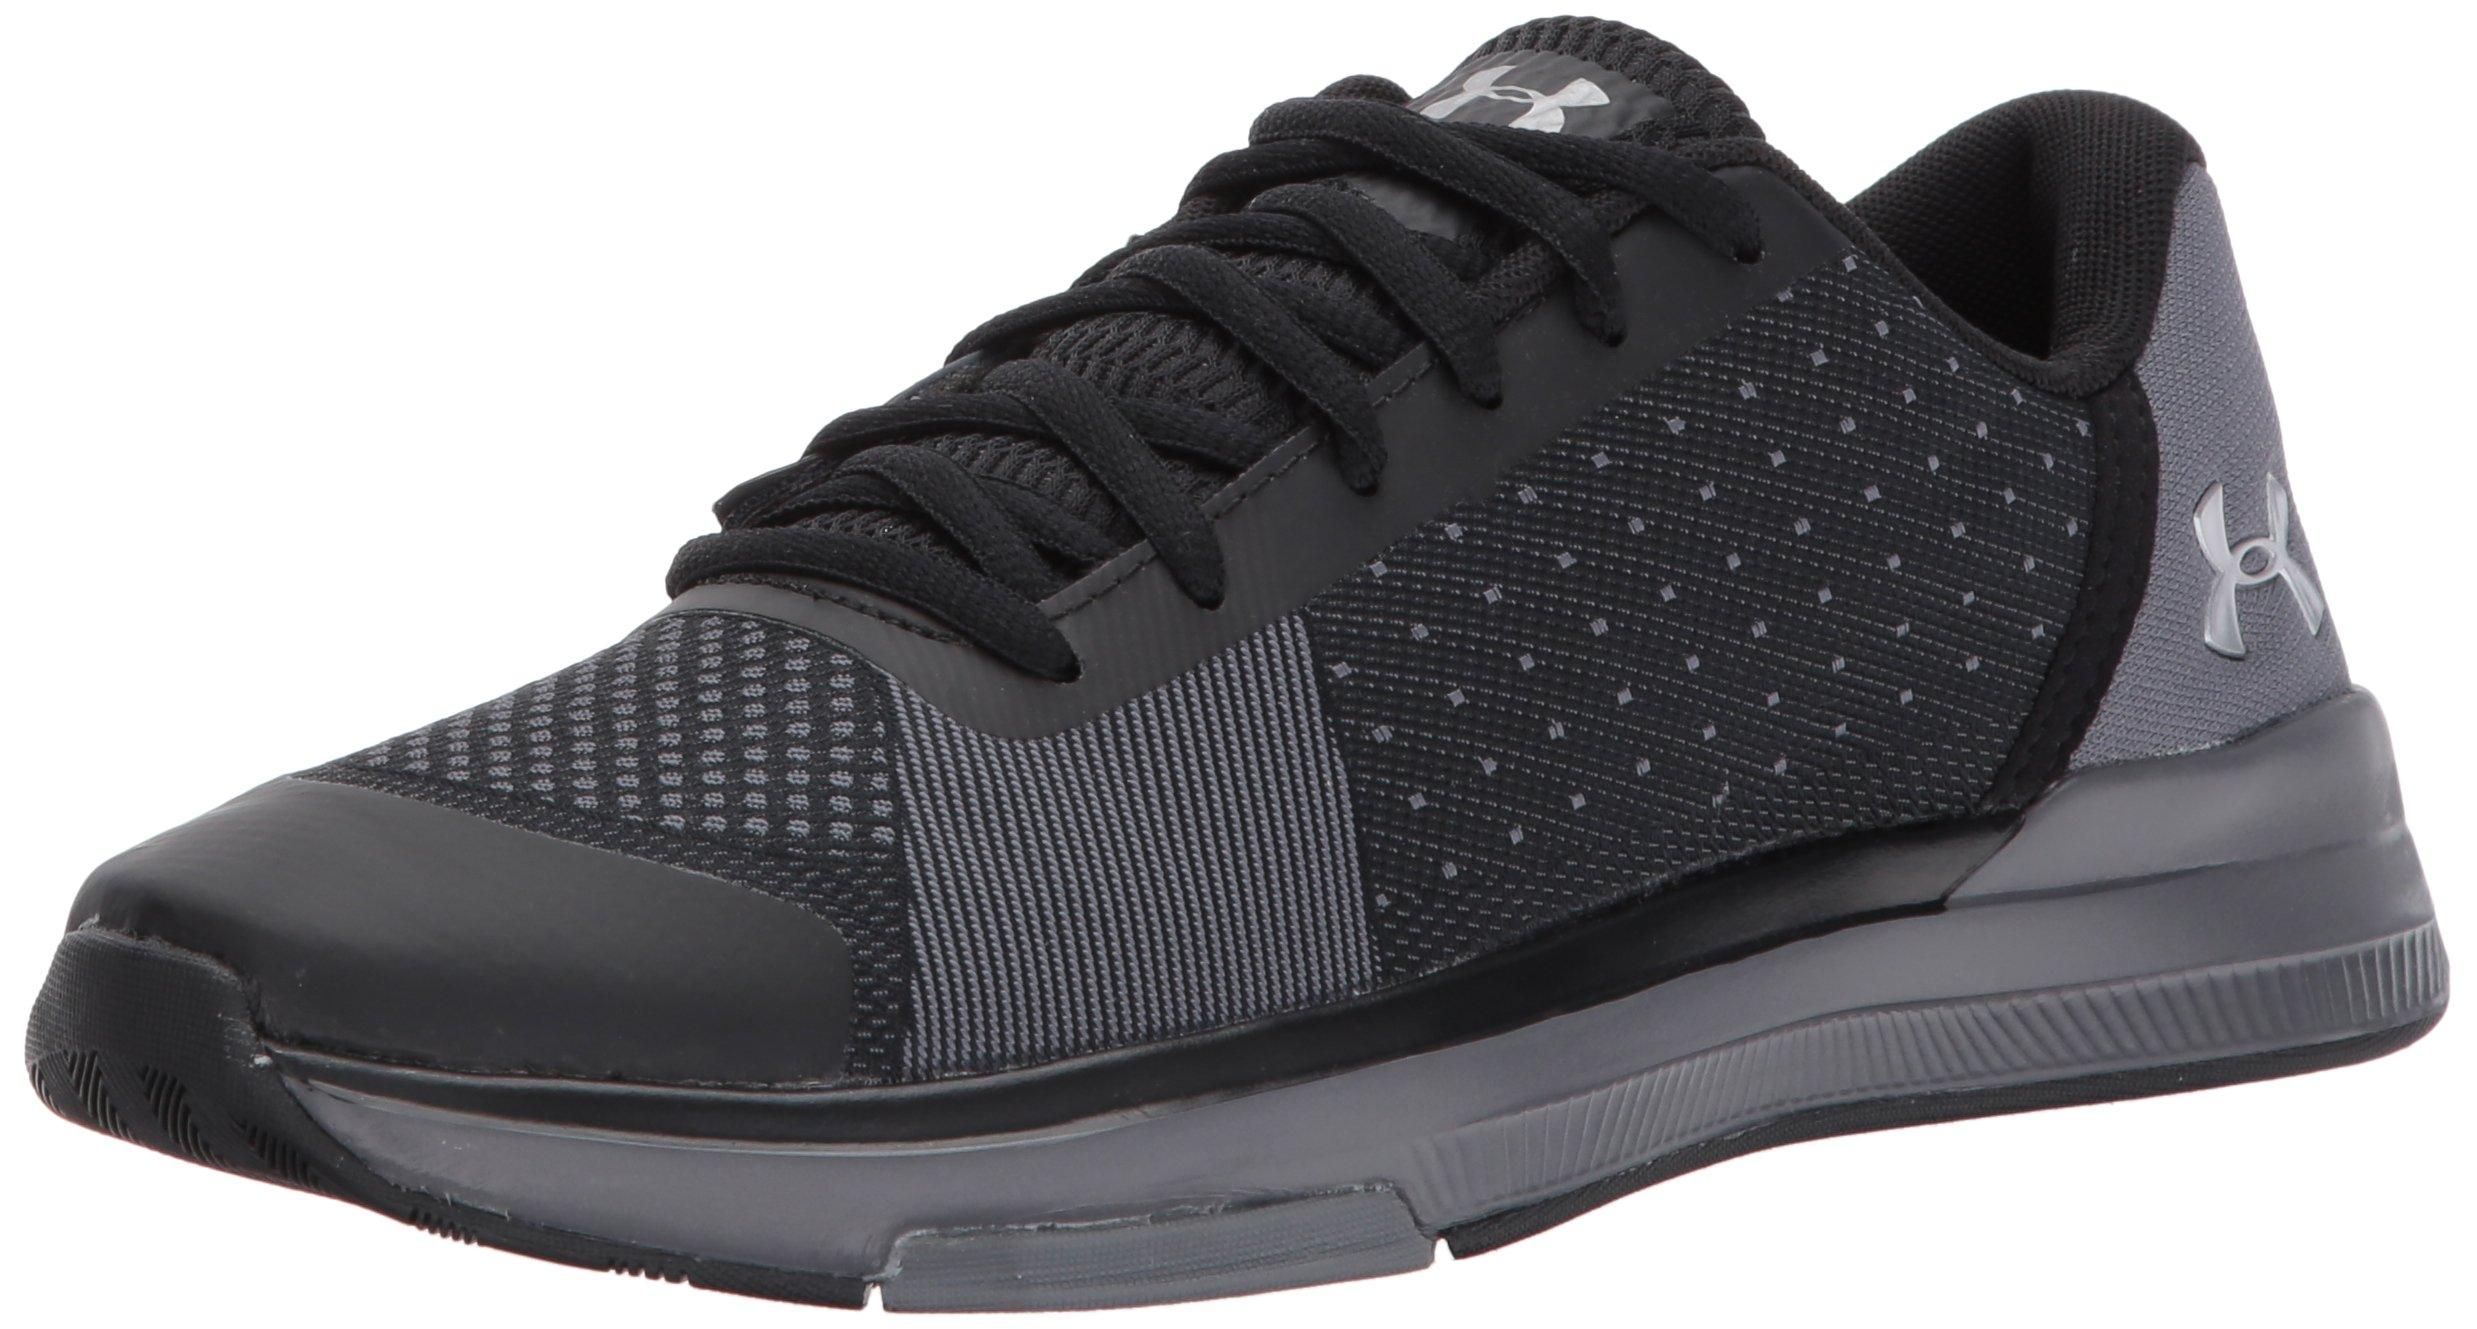 Under Armour Women's Showstopper Sneaker, Black (001)/Graphite, 8.5